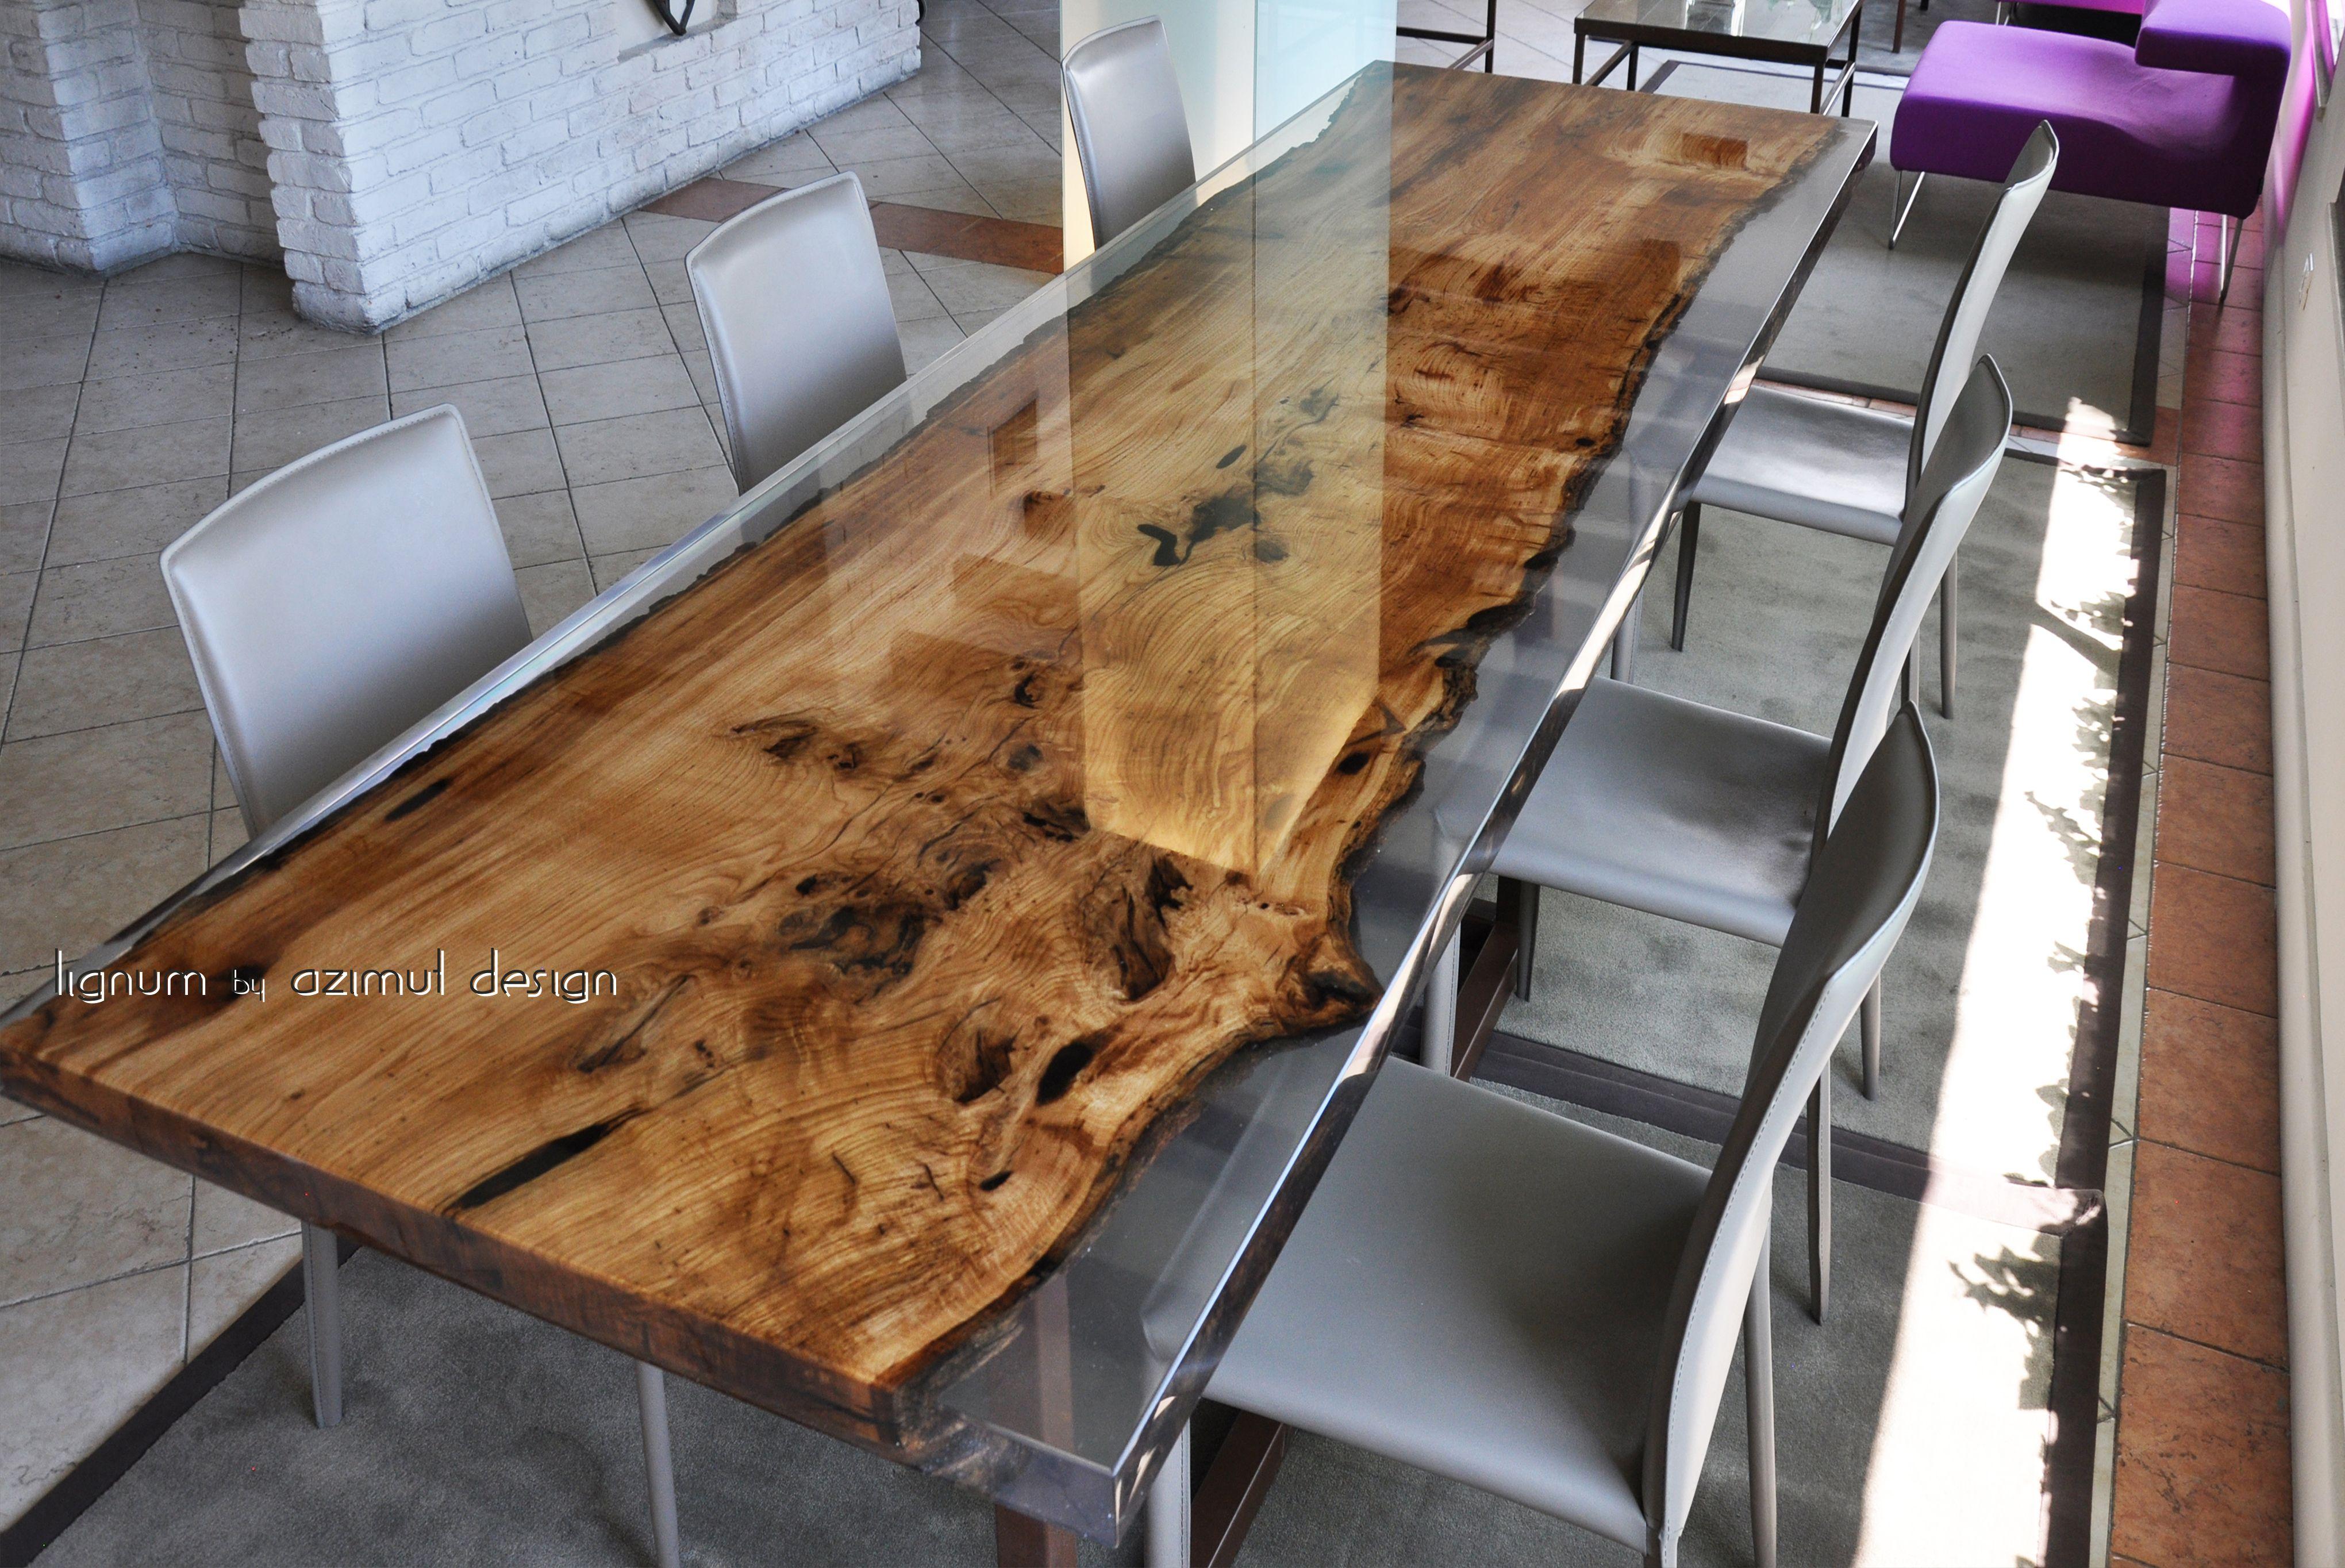 In Legno Wood Design design elements for interiors: custom solutions (con